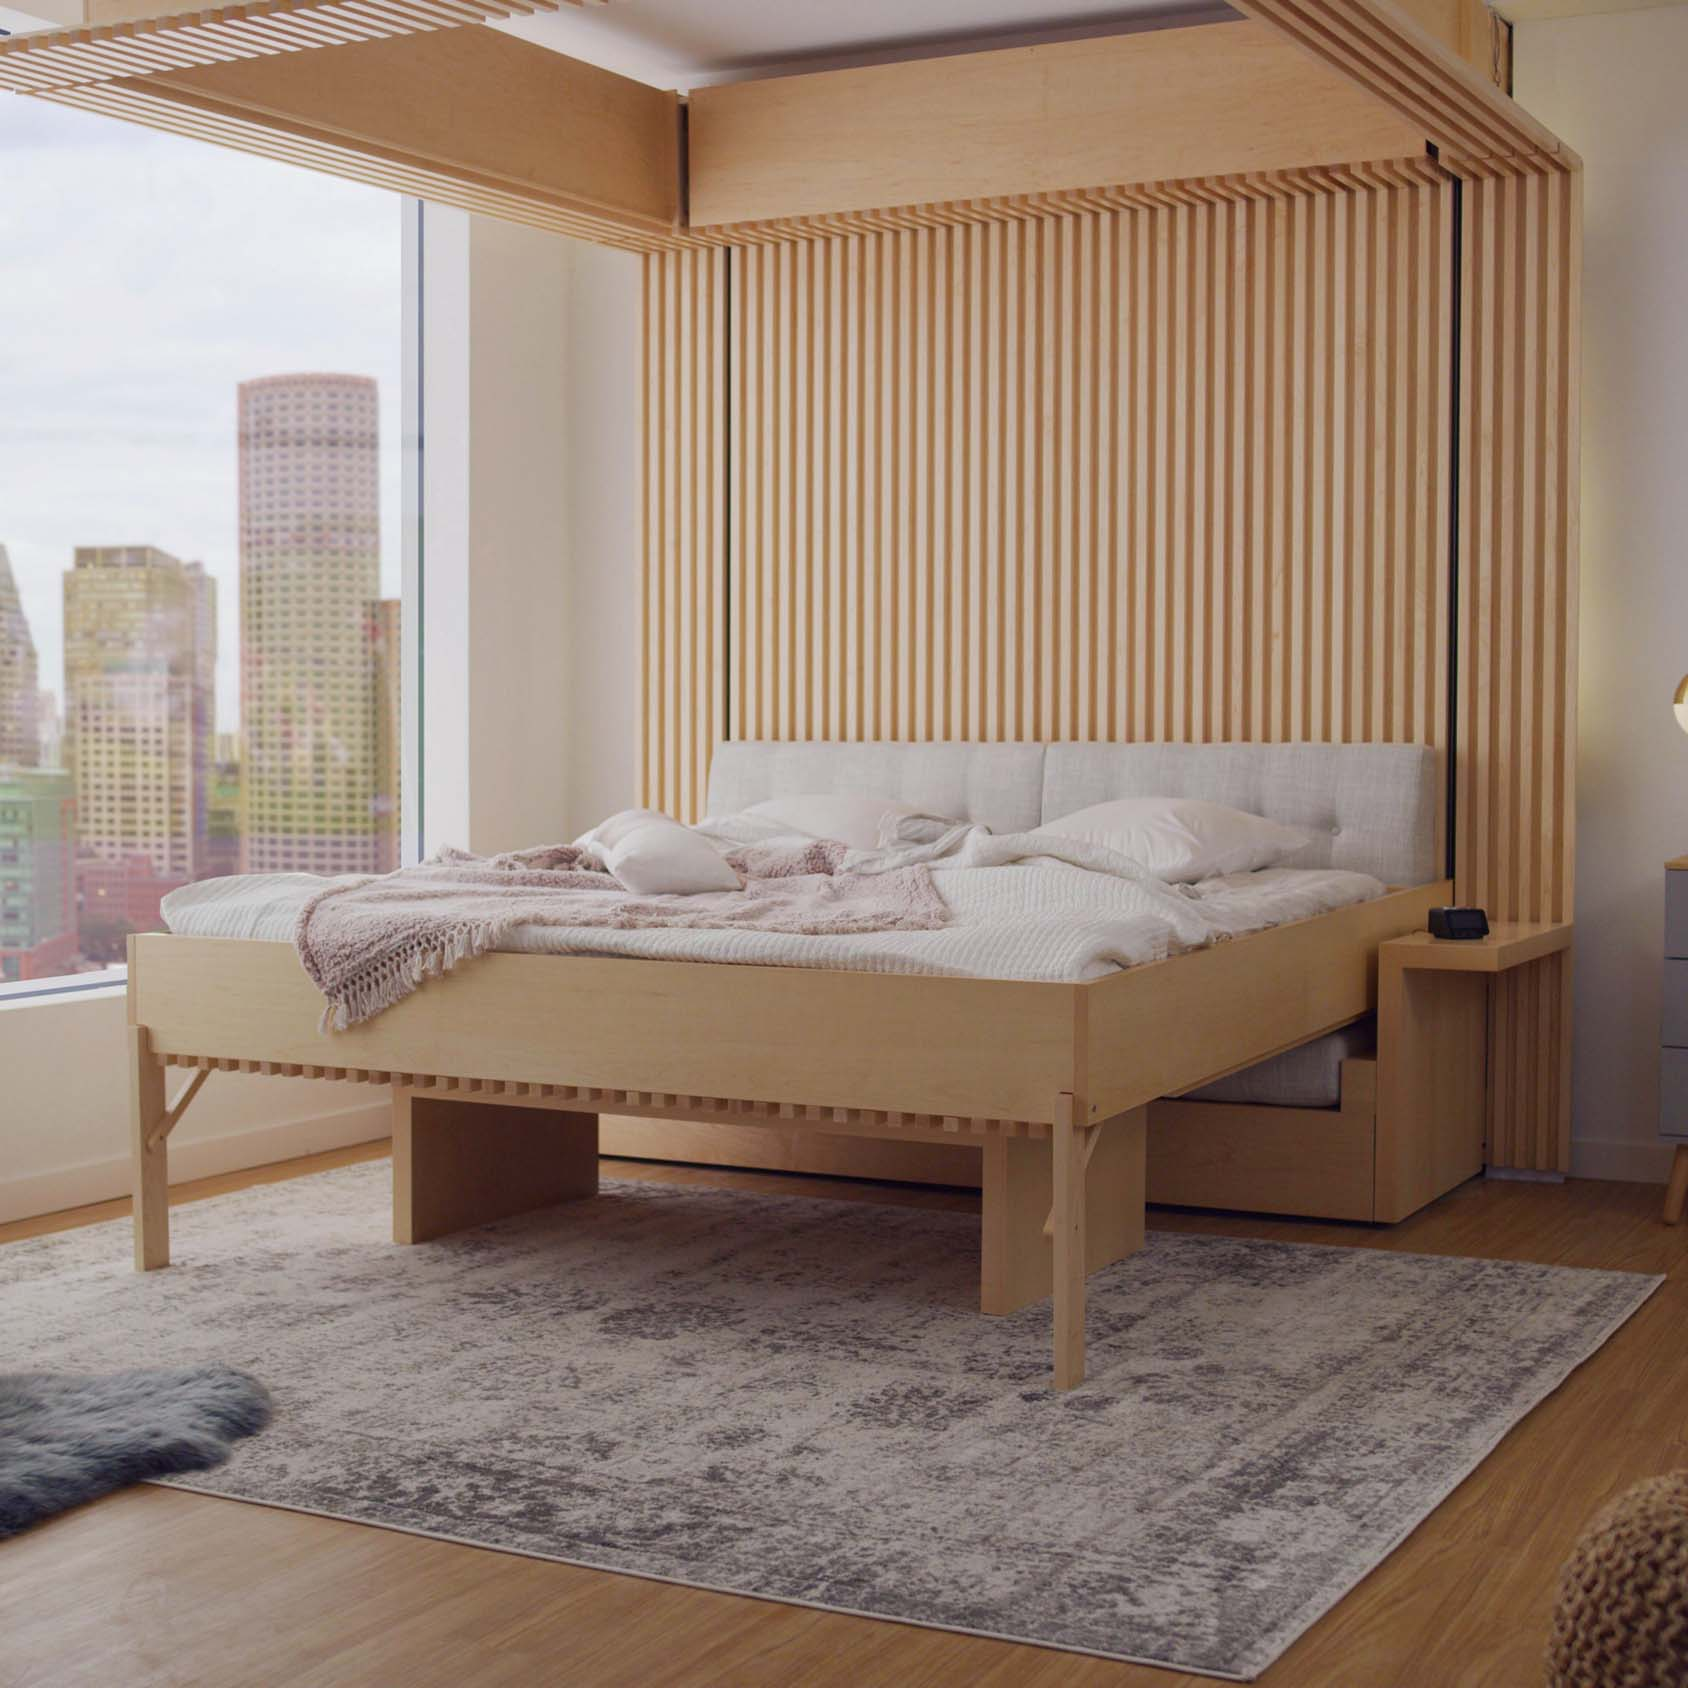 Ori's Cloud Bed inside a beautiful, modern apartment